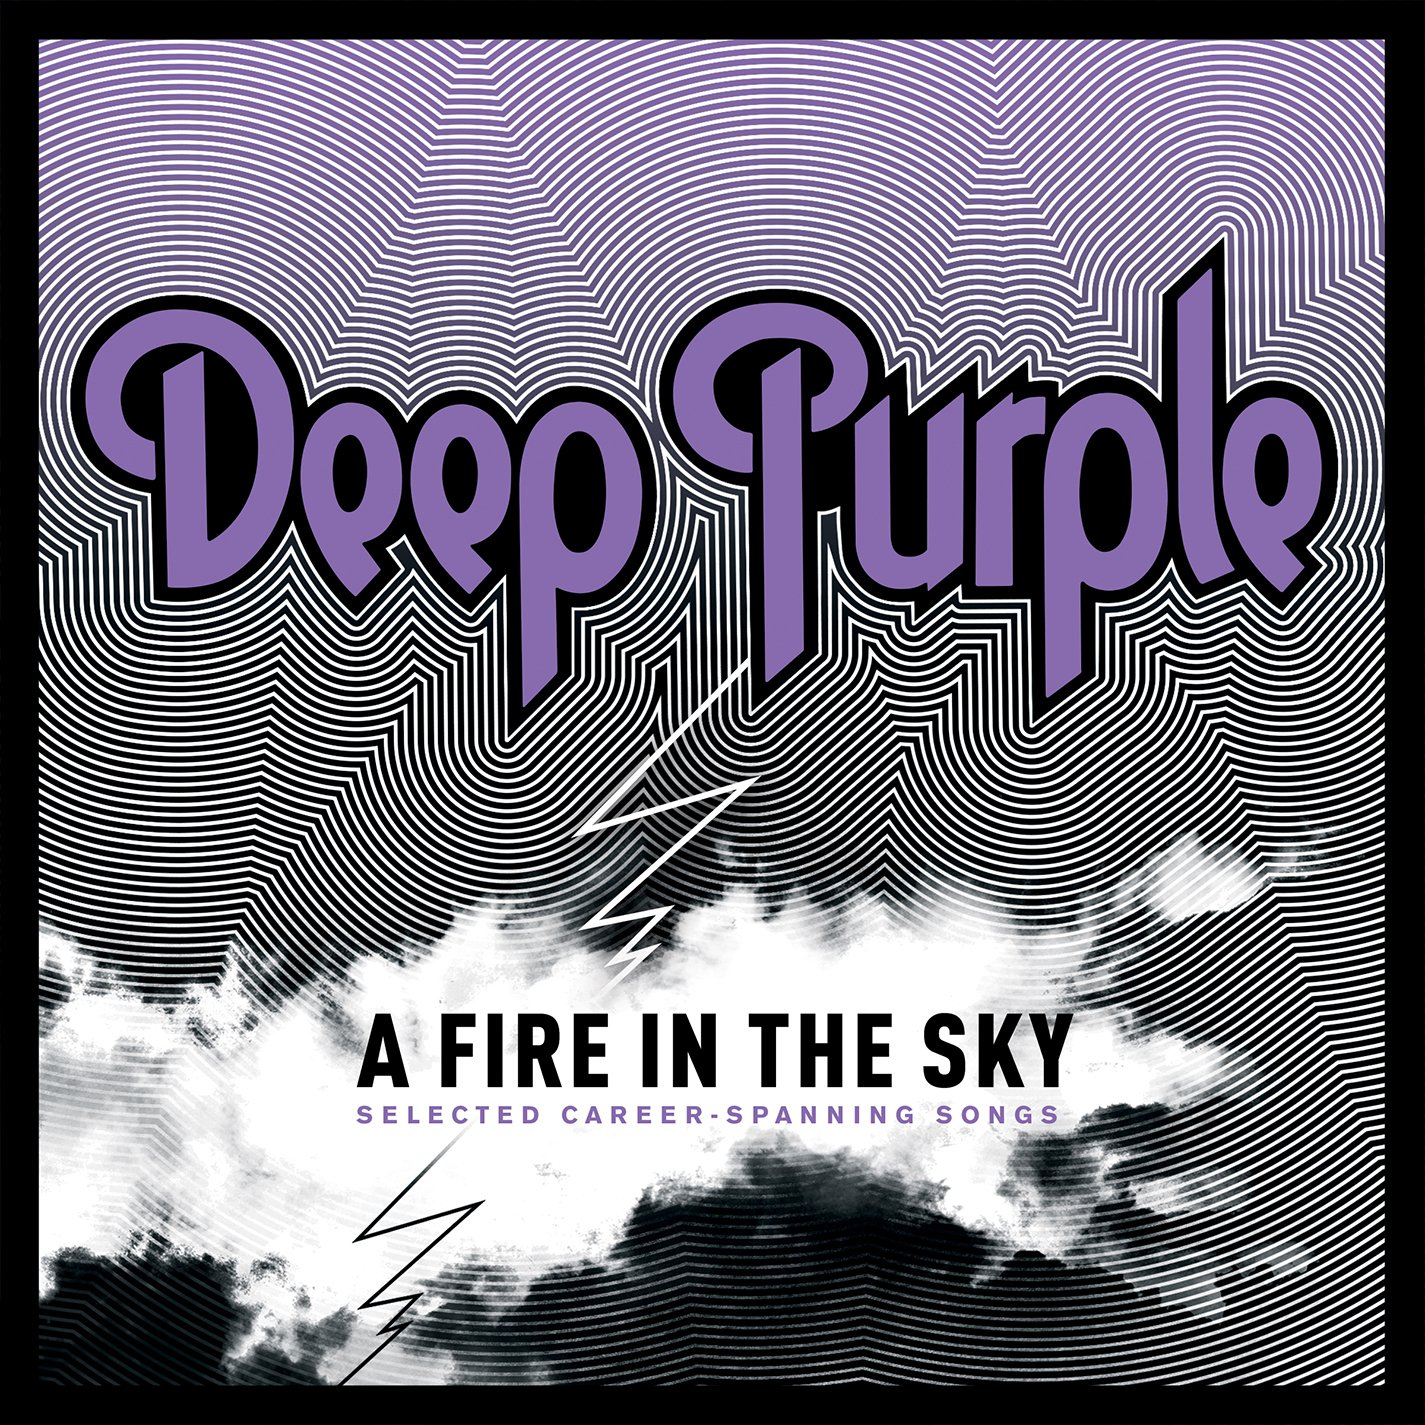 Deep purple fireball скачать бесплатно mp3